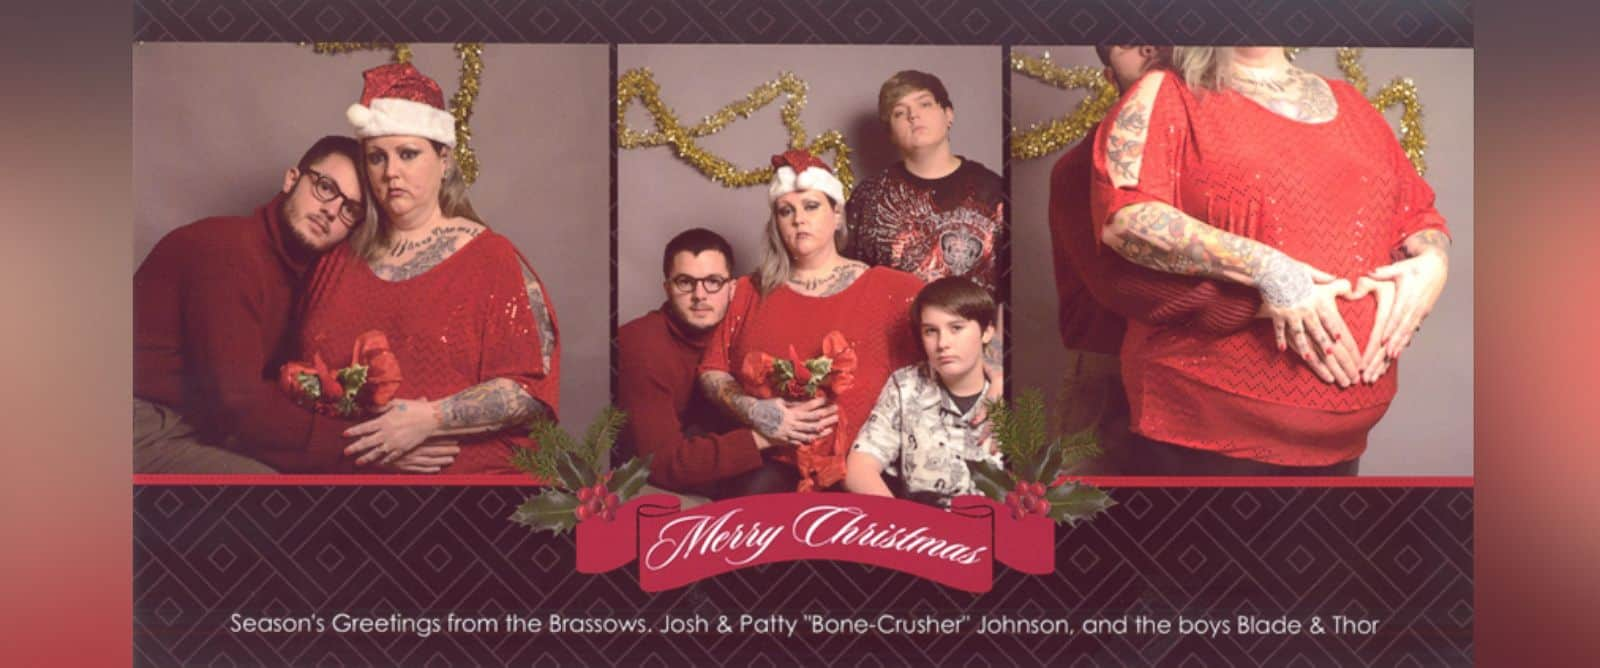 Hilarious Family Christmas Portraits